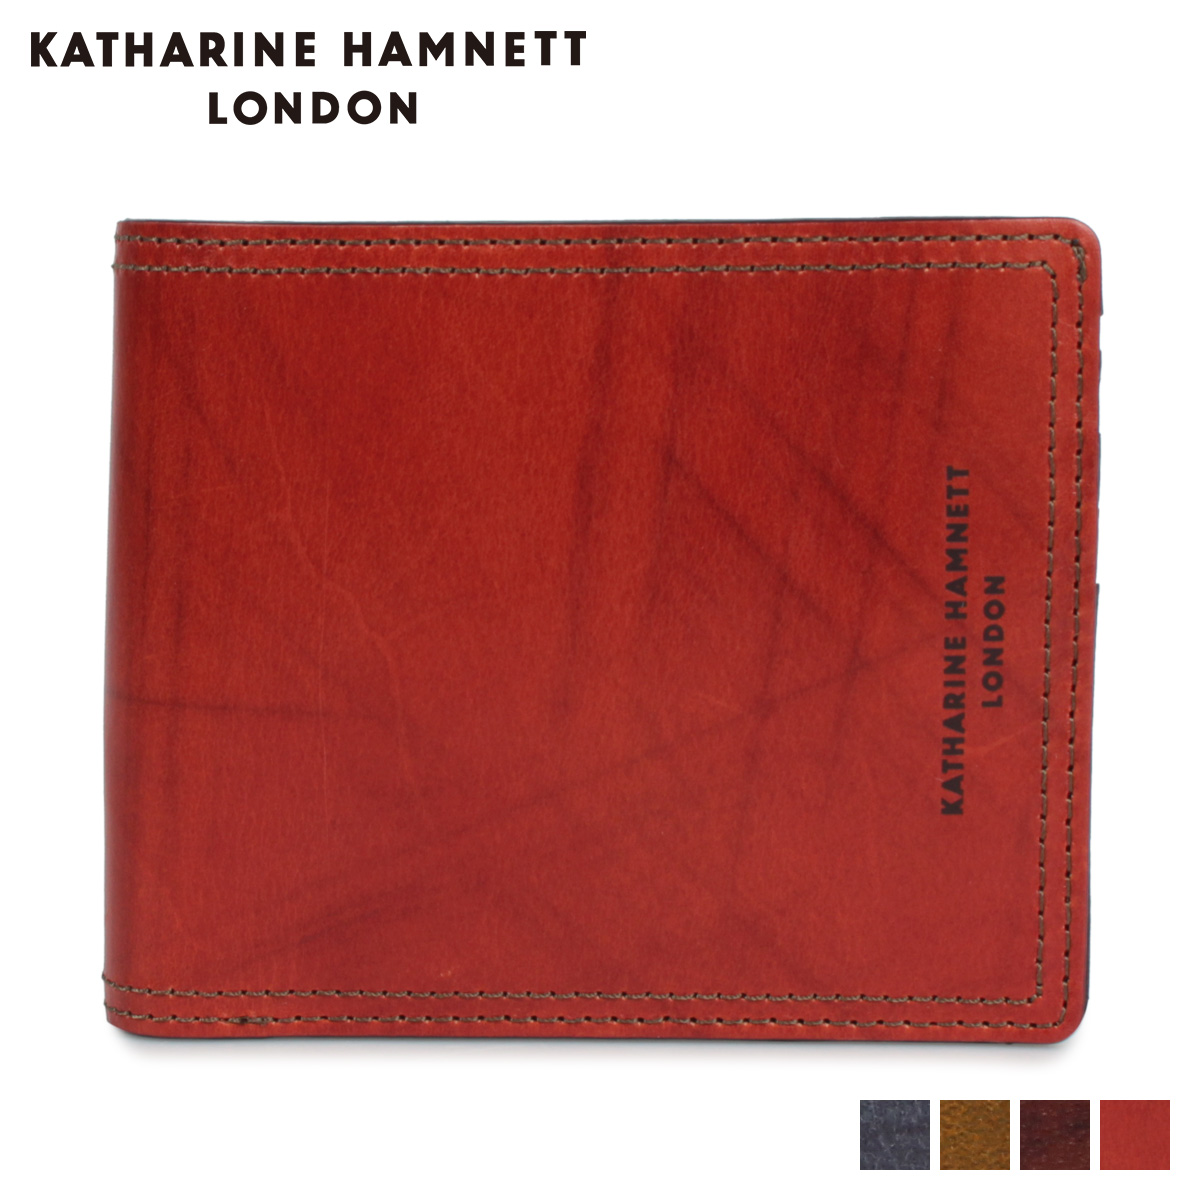 KATHARINE HAMNETT LONDON MINI WALLET キャサリンハムネット ロンドン 財布 二つ折り メンズ ネイビー オリーブ ダーク ブラウン KH-1212015 [11/8 新入荷]